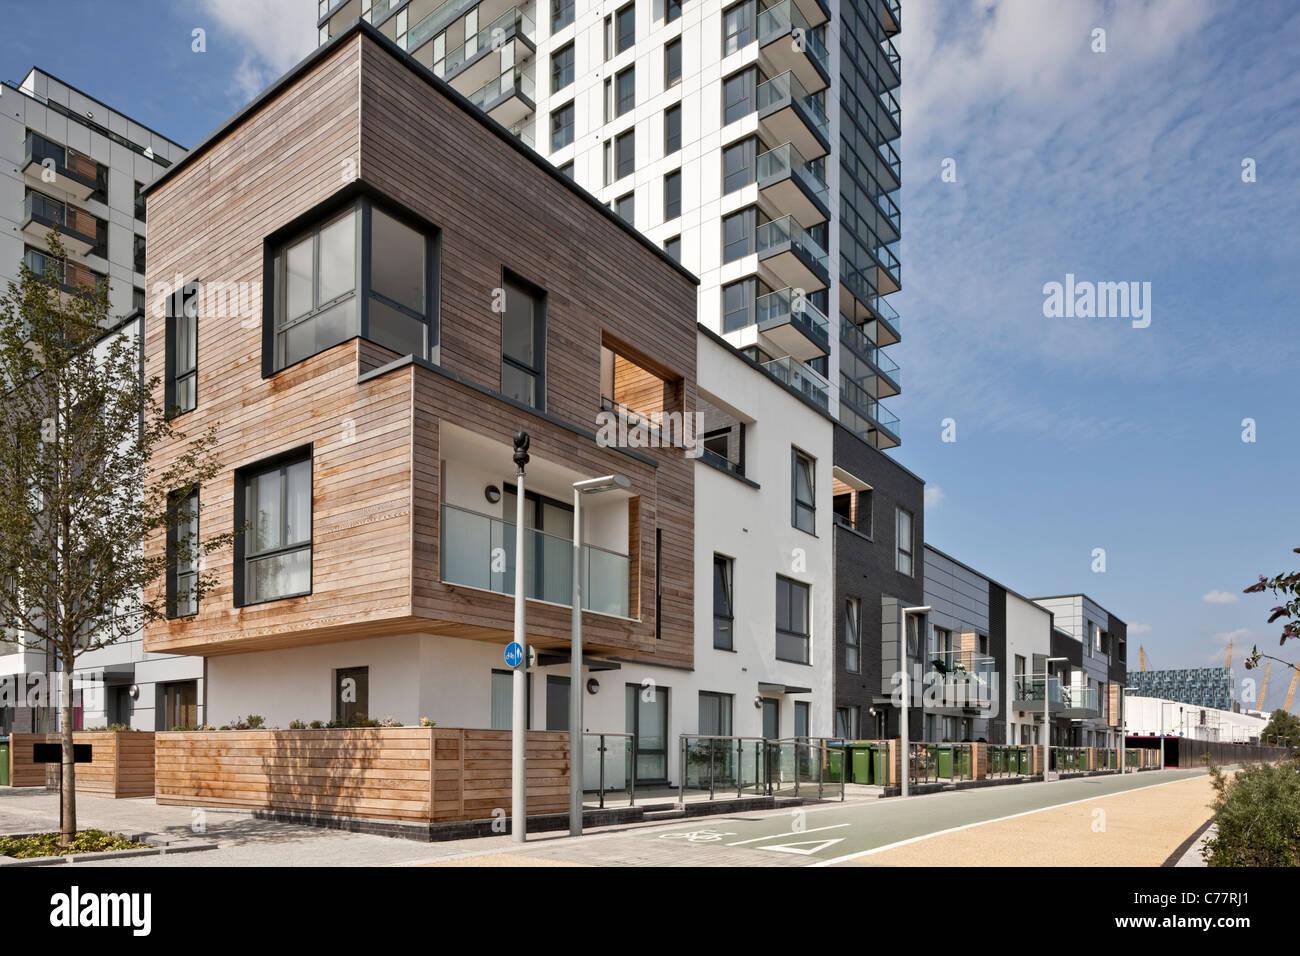 City Peninsula Apartments In Greenwich London Stock Photo